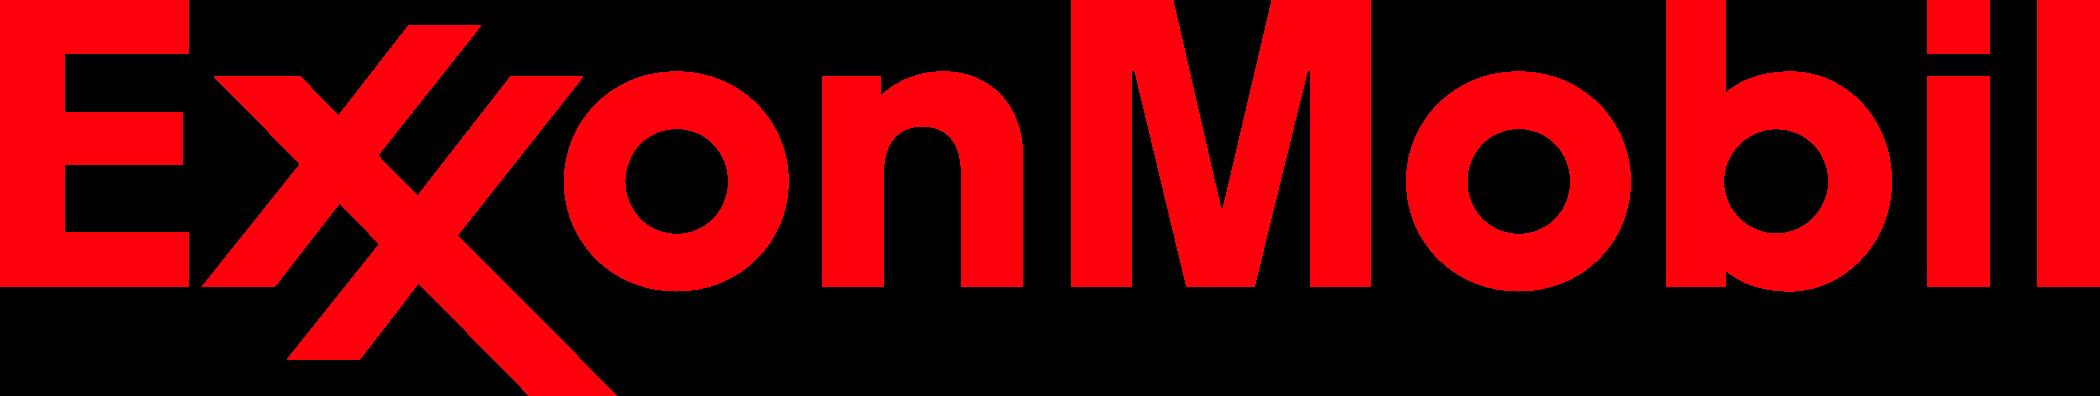 exxonmobil-logo-1